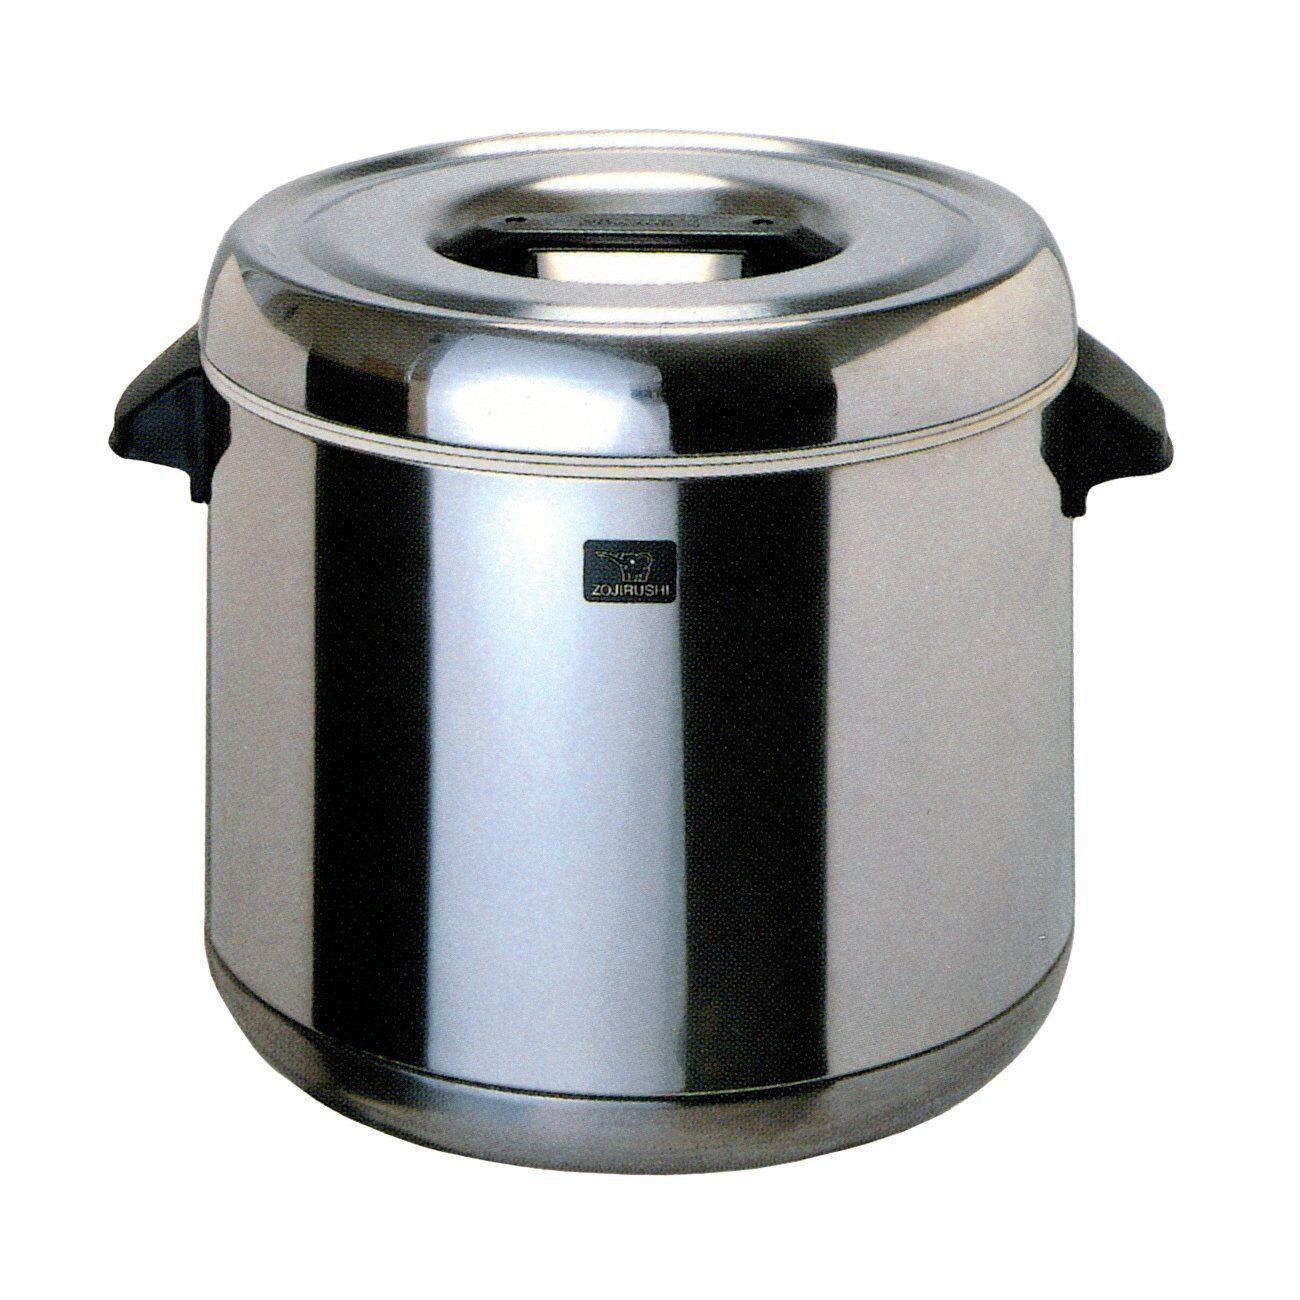 Zojirushi RDS-600 6 litres thermique riz Warmer en acier inoxydable, NEUF